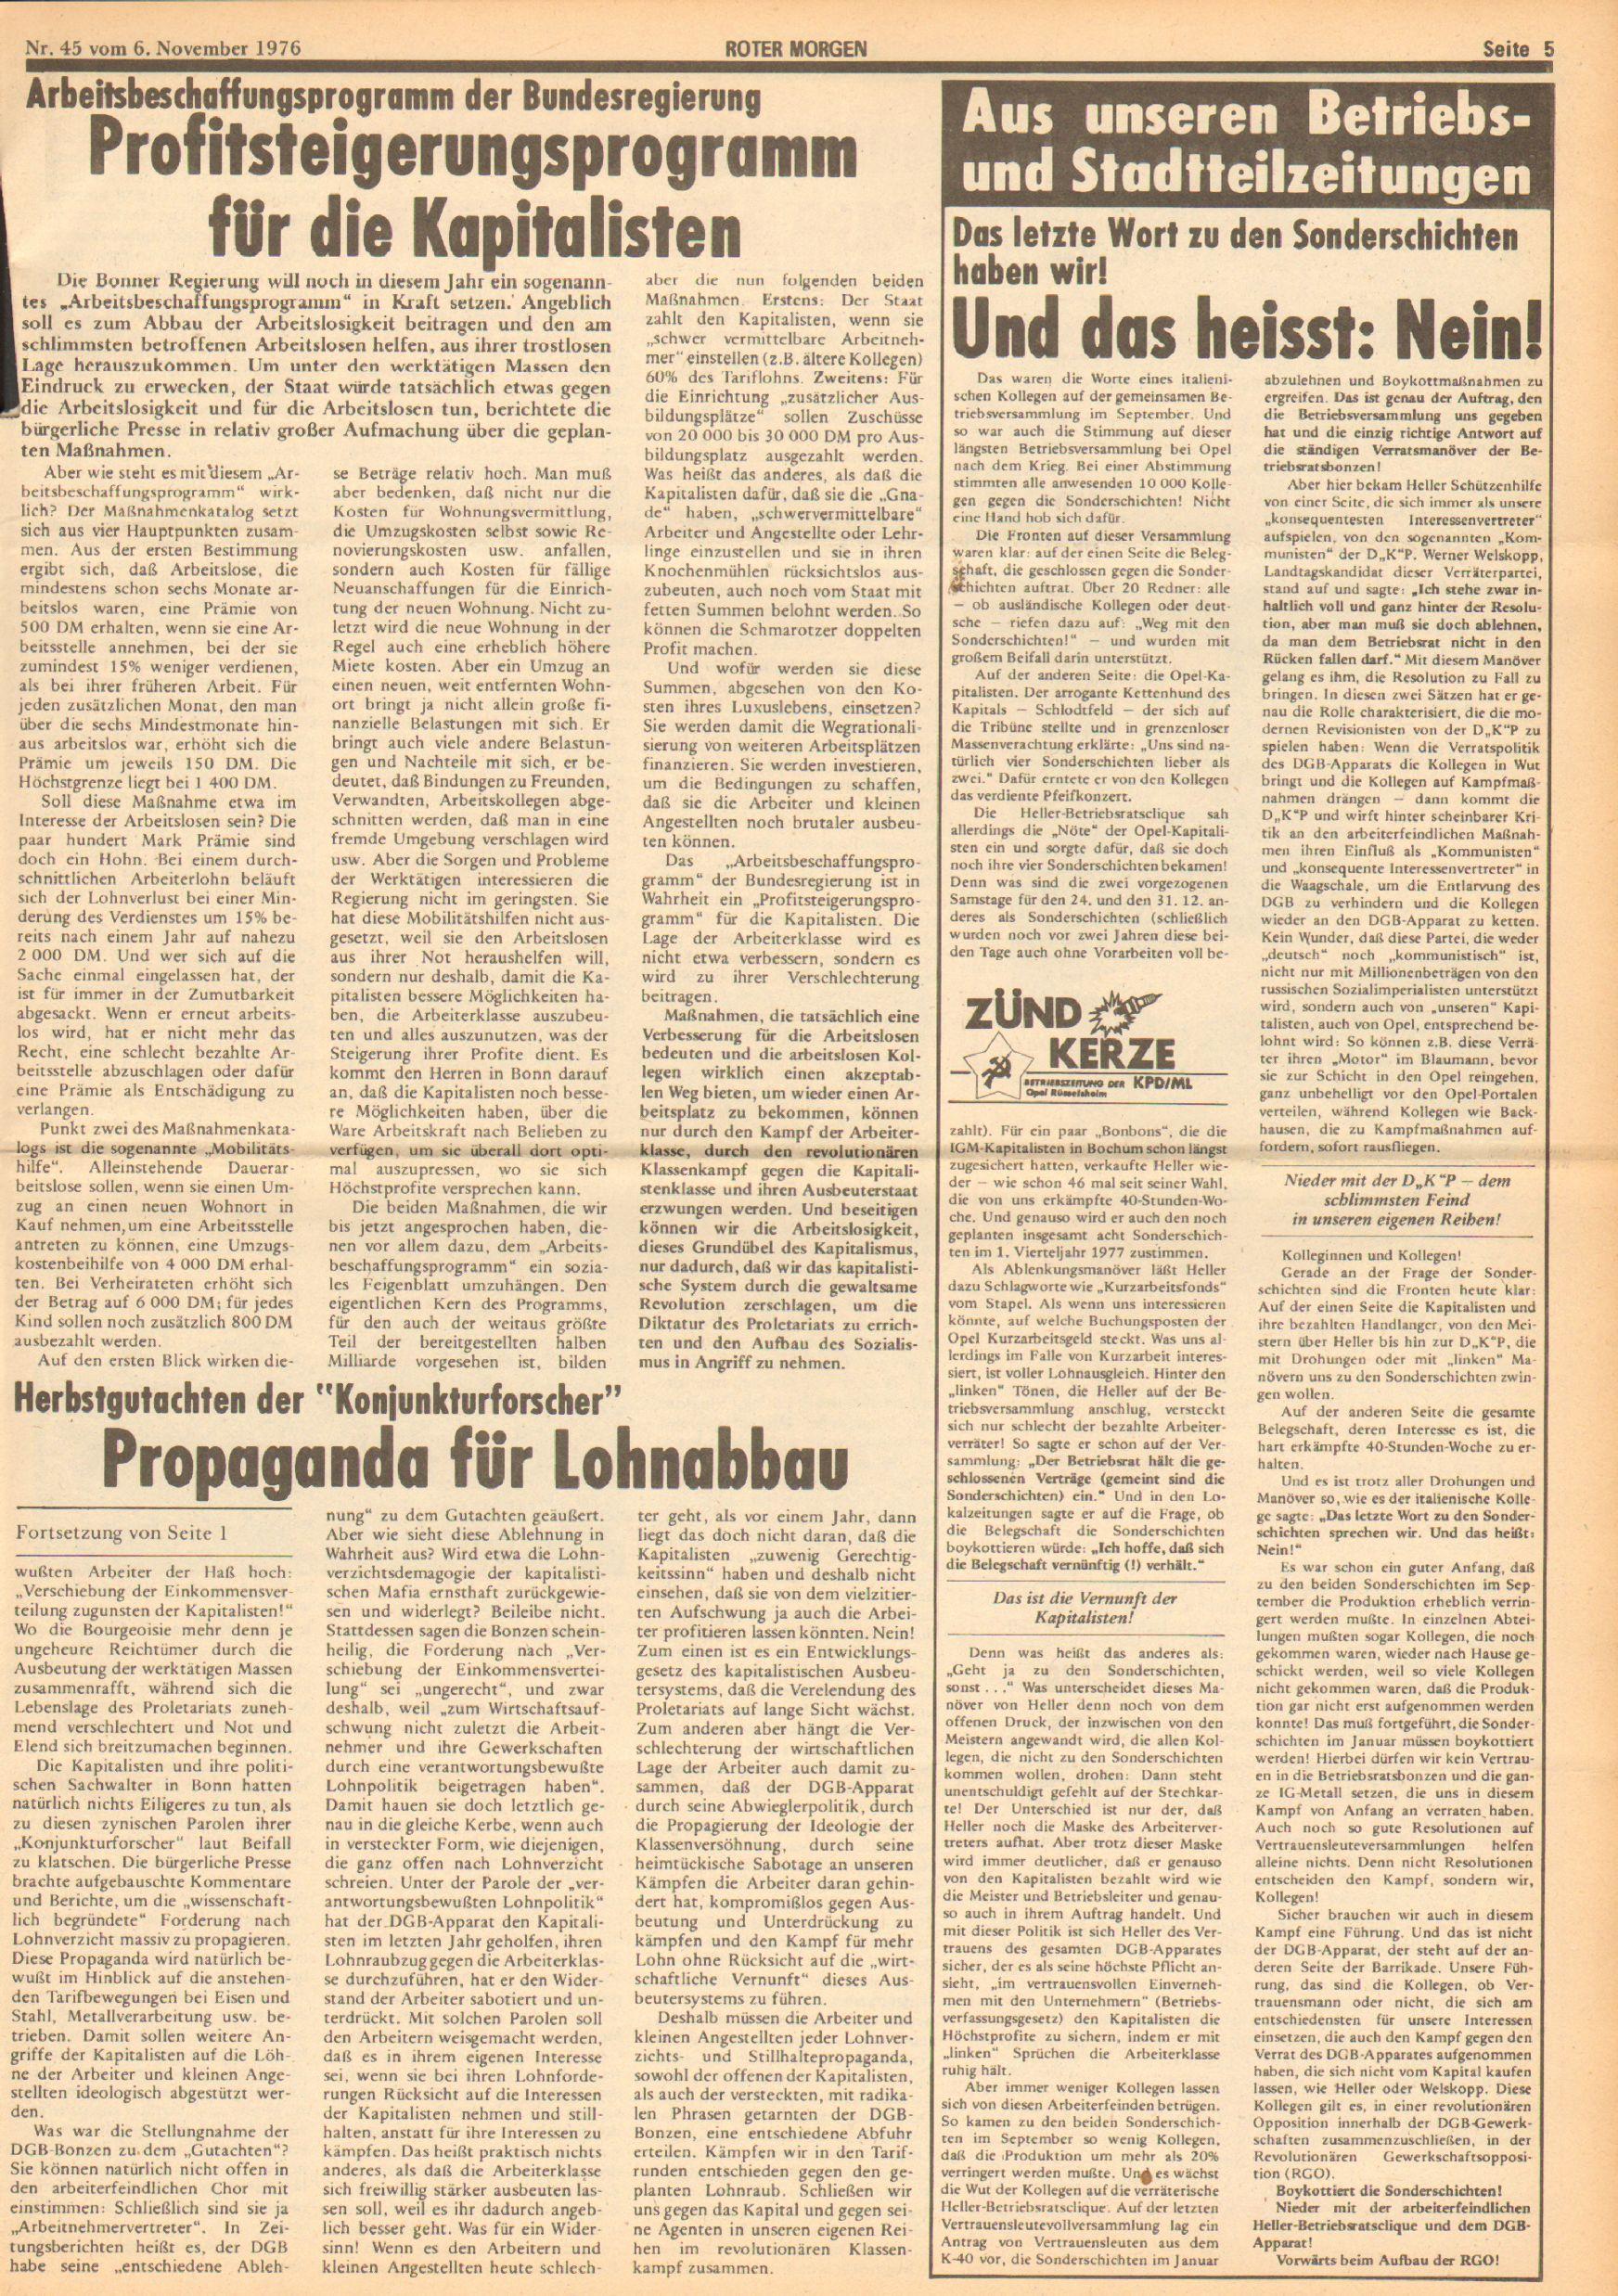 Roter Morgen, 10. Jg., 6. November 1976, Nr. 45, Seite 5